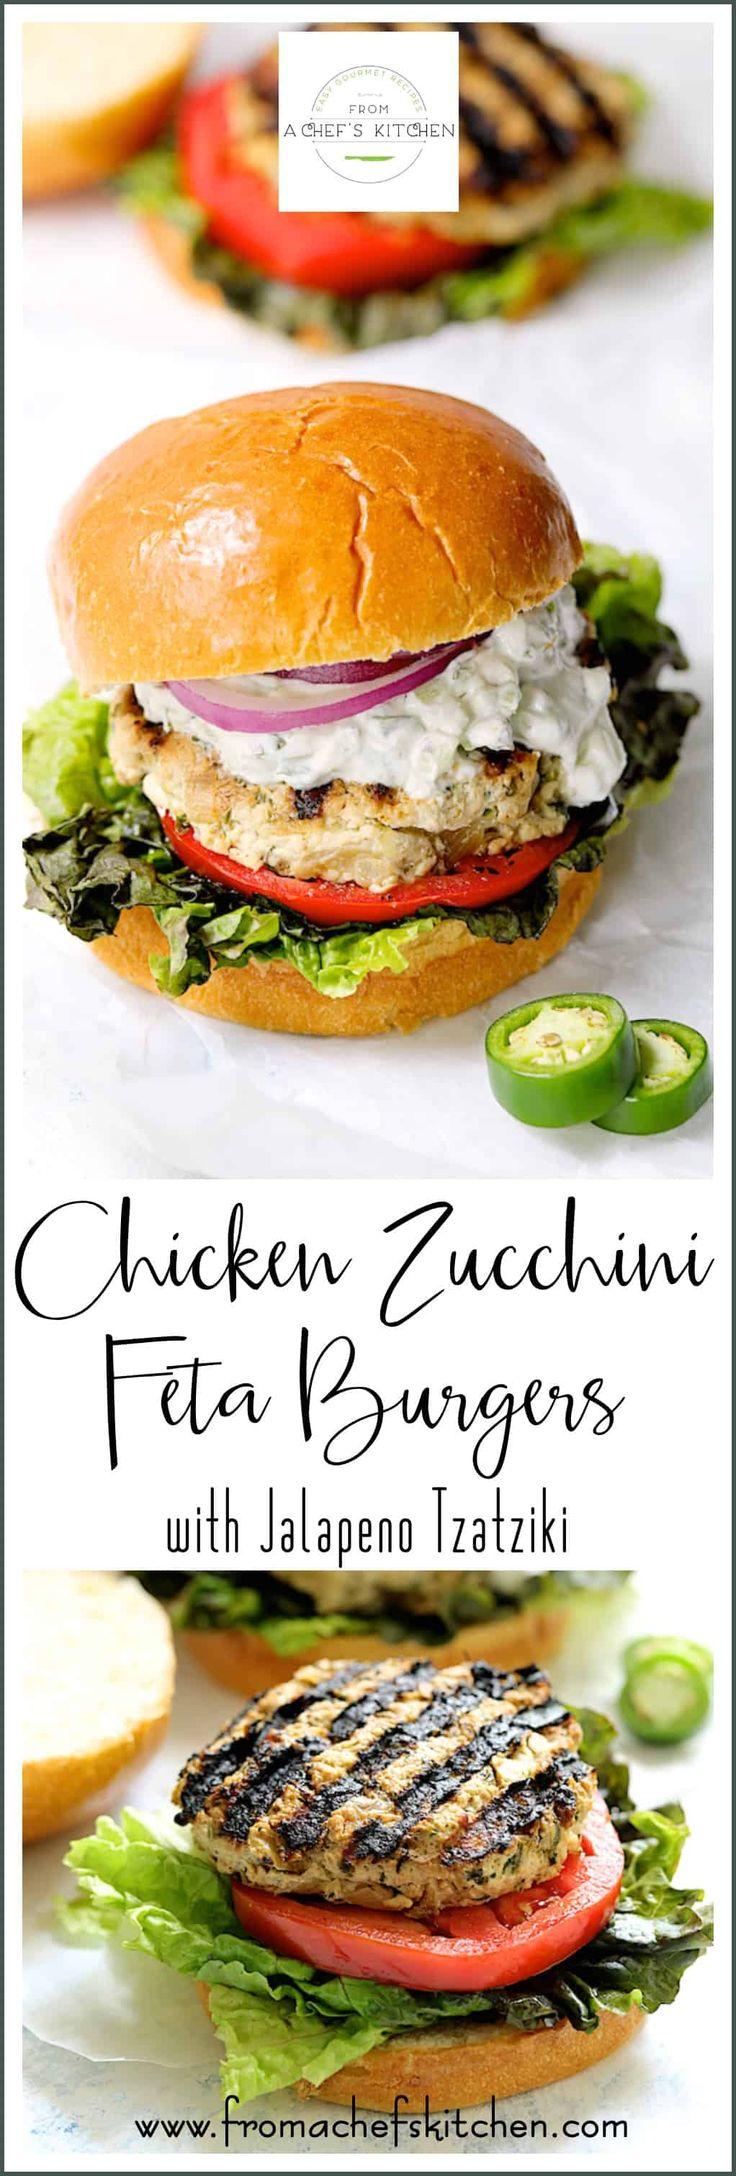 Chicken Zucchini Feta Burgers with Jalapeno Tzatzi…